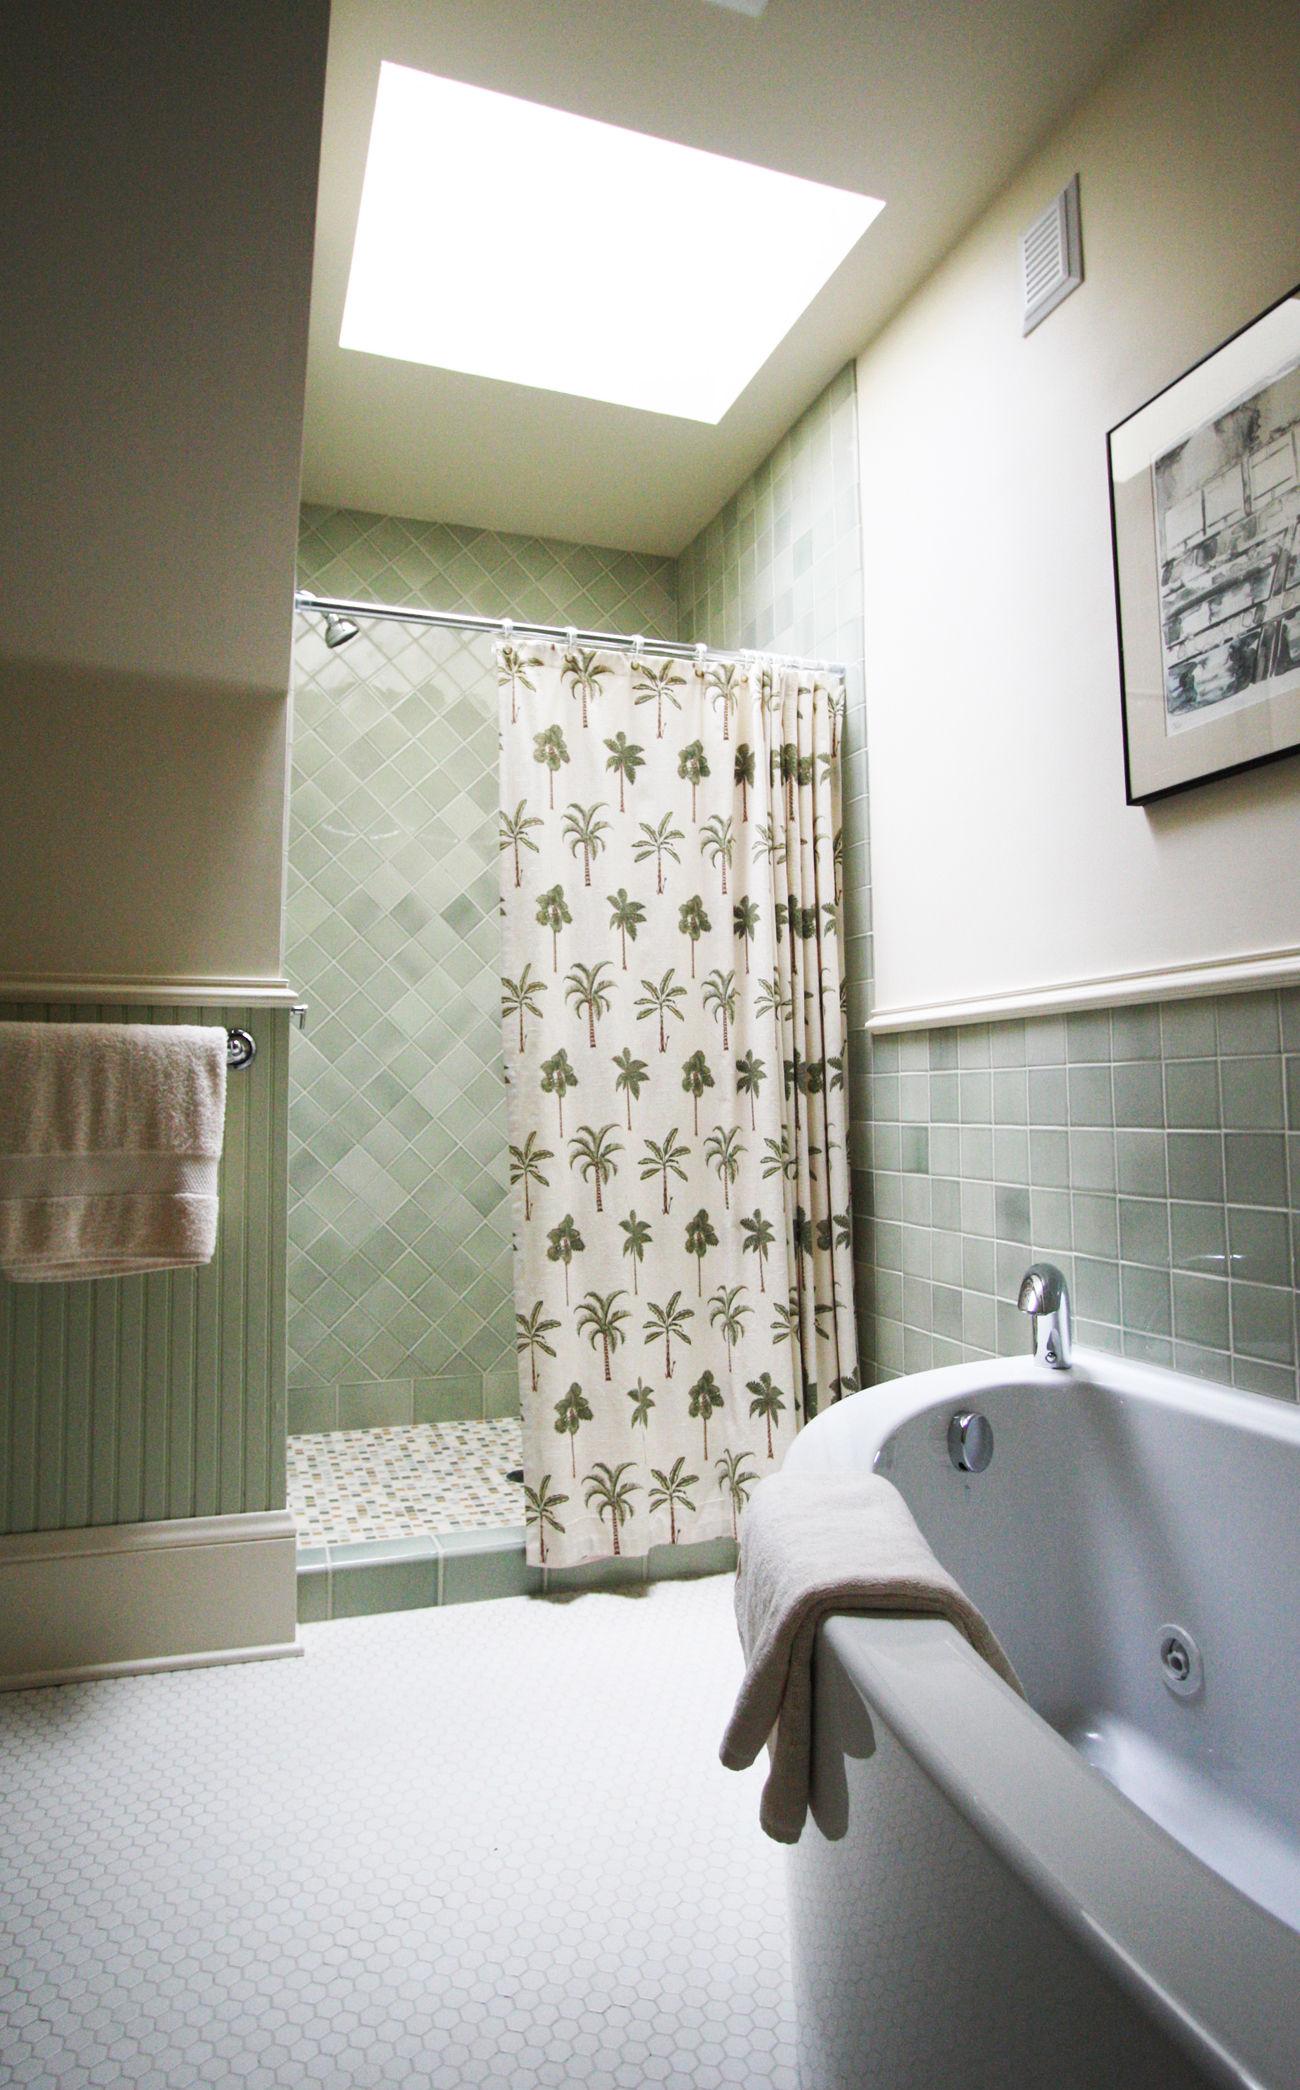 new blue glass tile bathroom design-Amazing Blue Glass Tile Bathroom Photograph